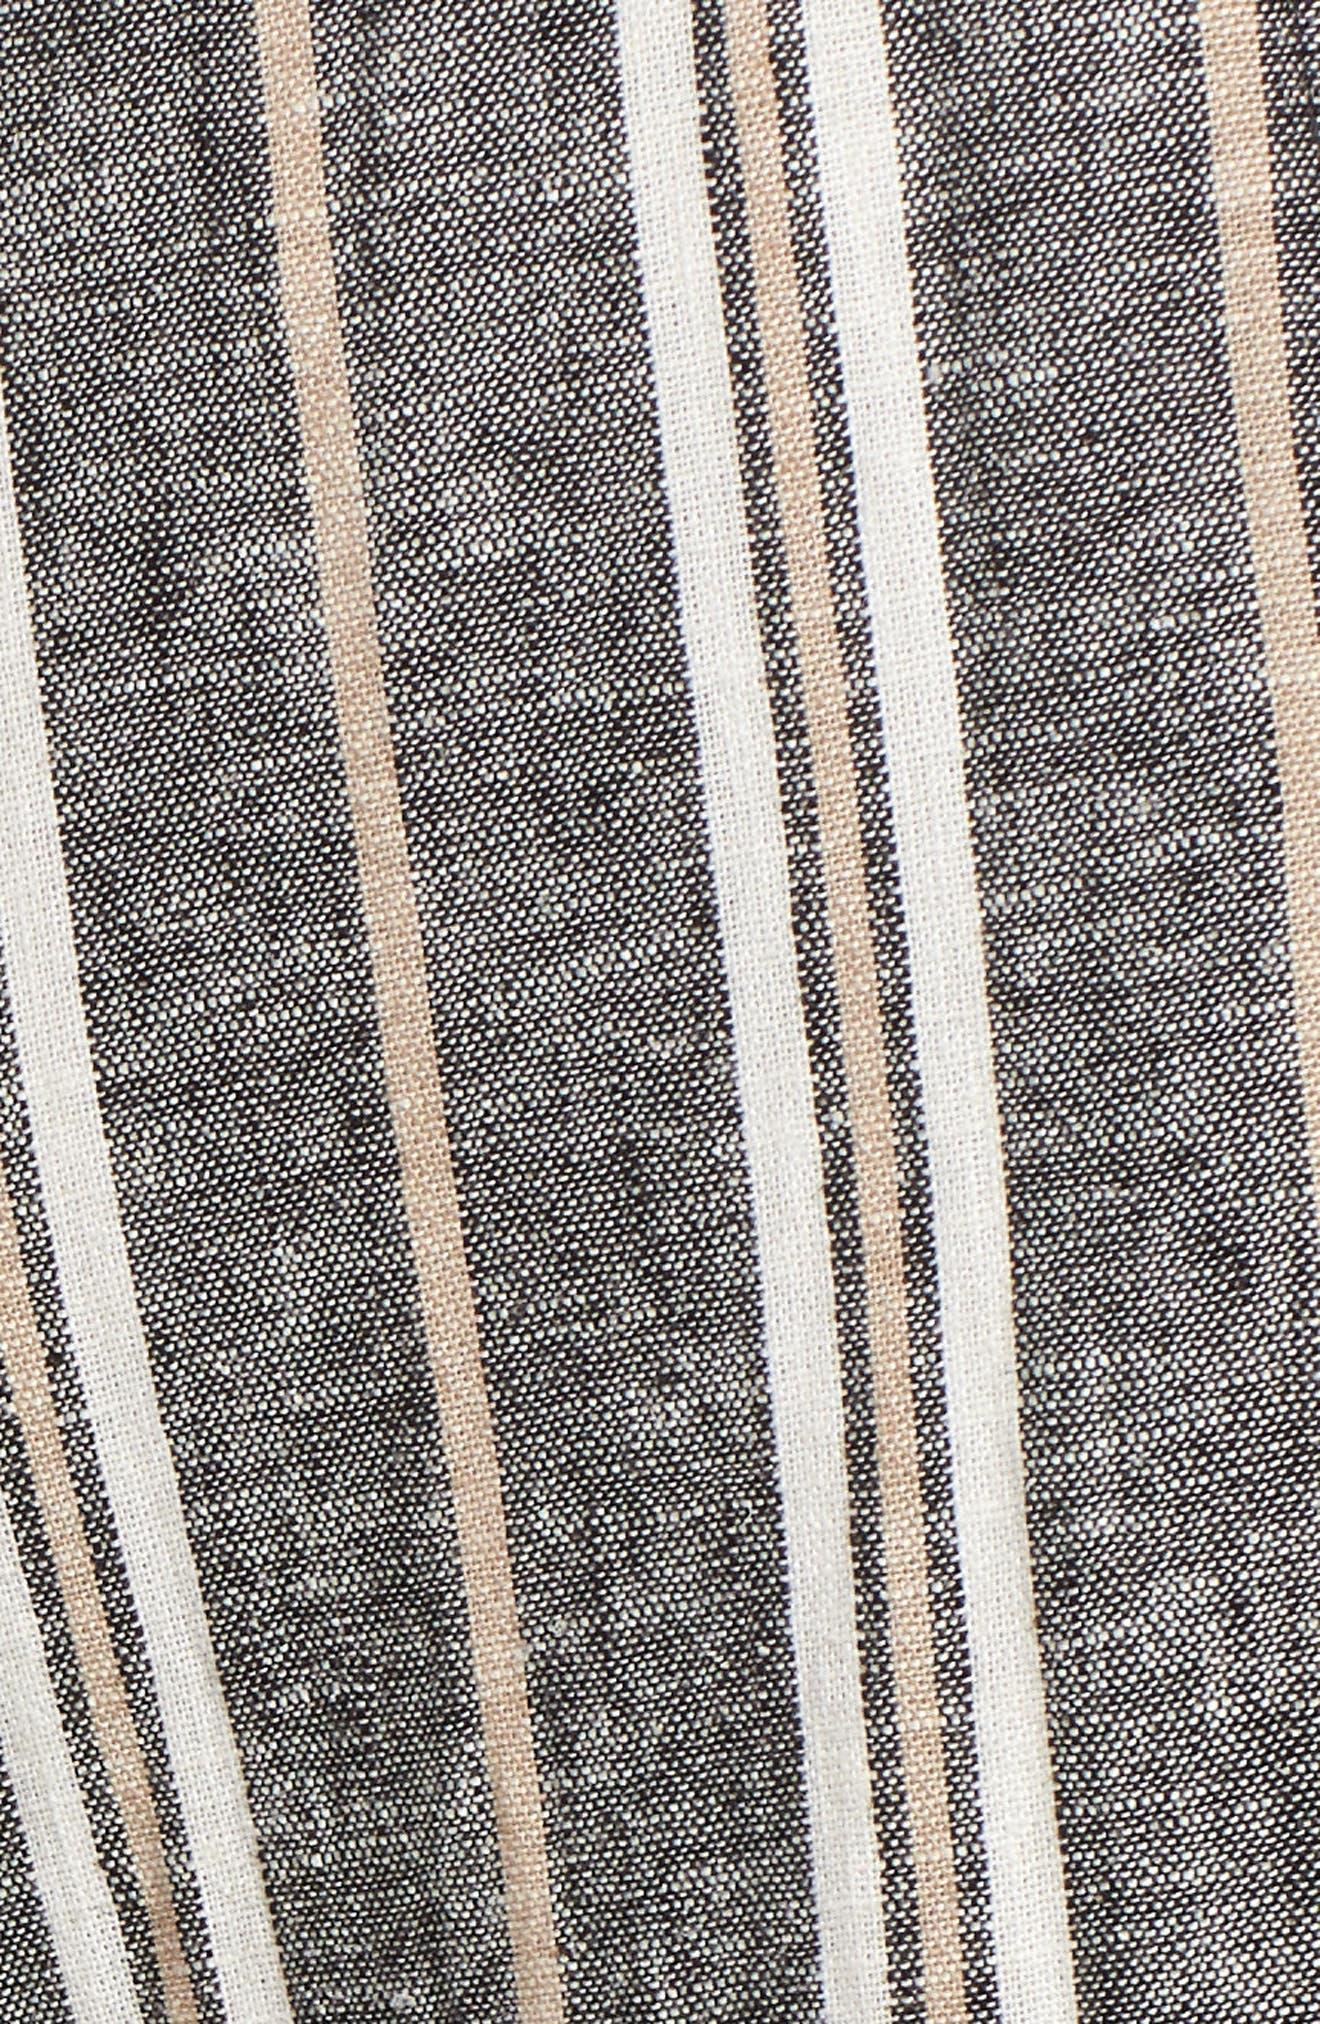 Stripe Linen Blend Pants,                             Alternate thumbnail 6, color,                             001